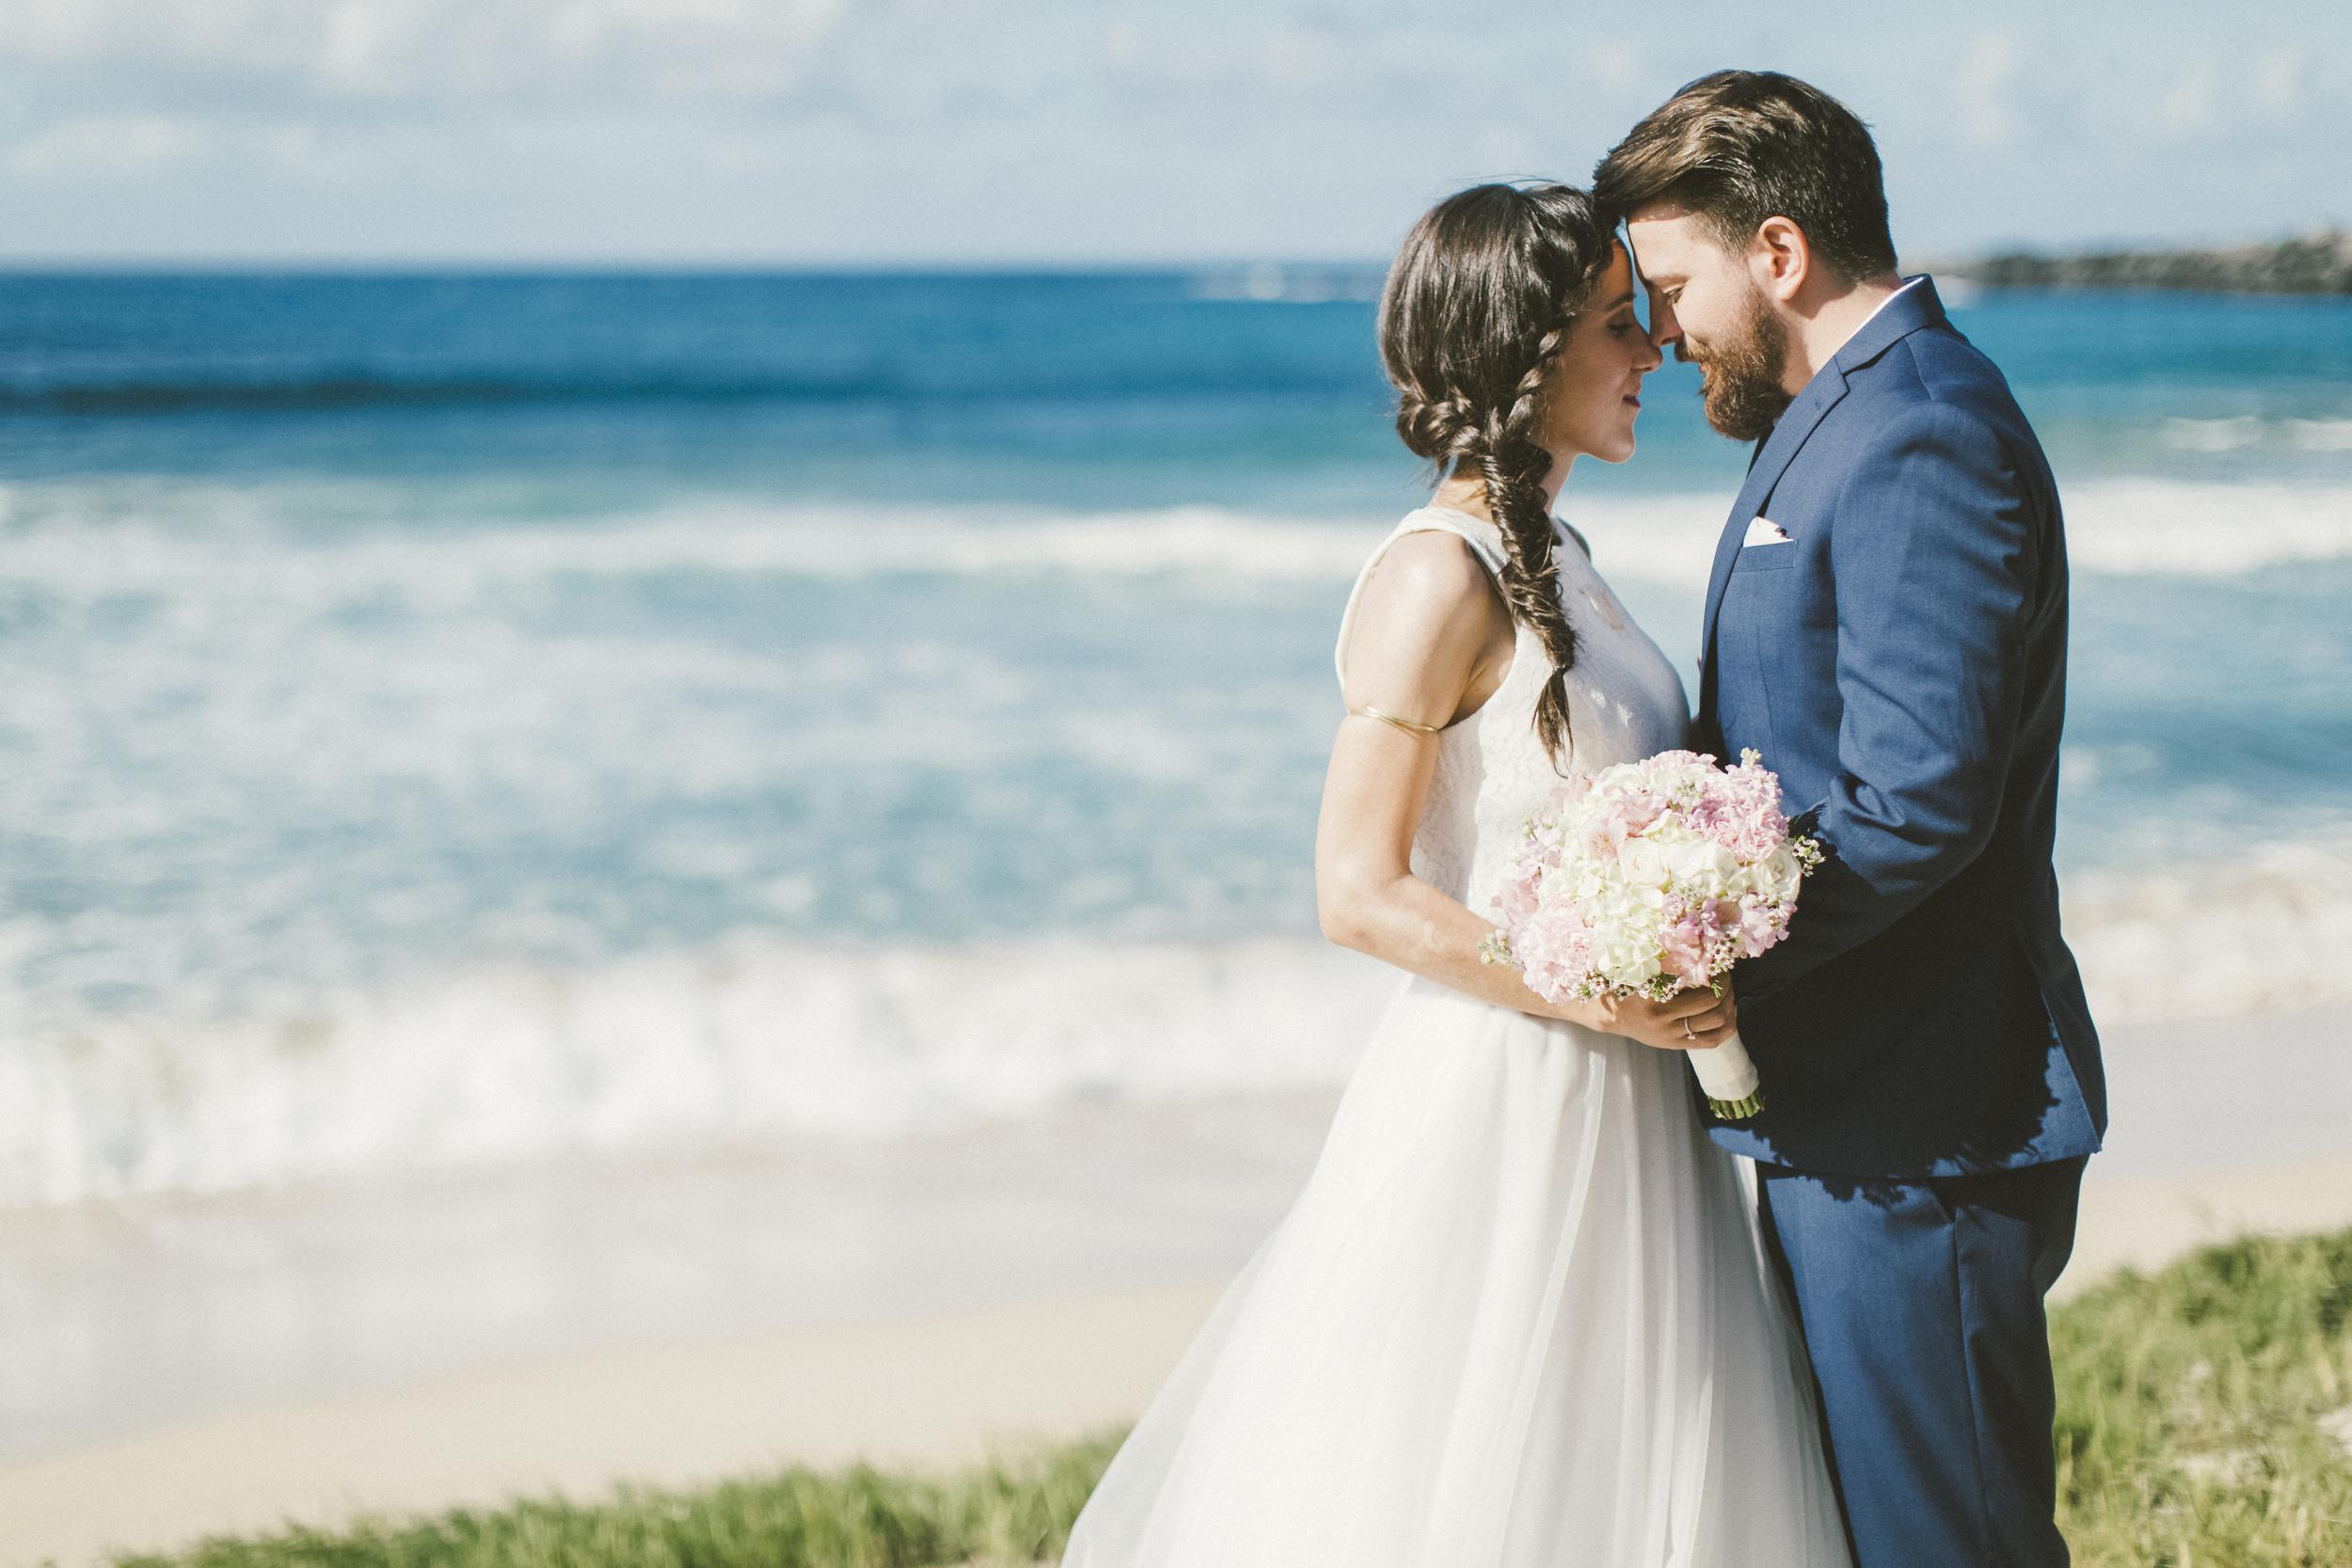 angie-diaz-photography-maui-wedding-ironwoods-beach-38.jpg